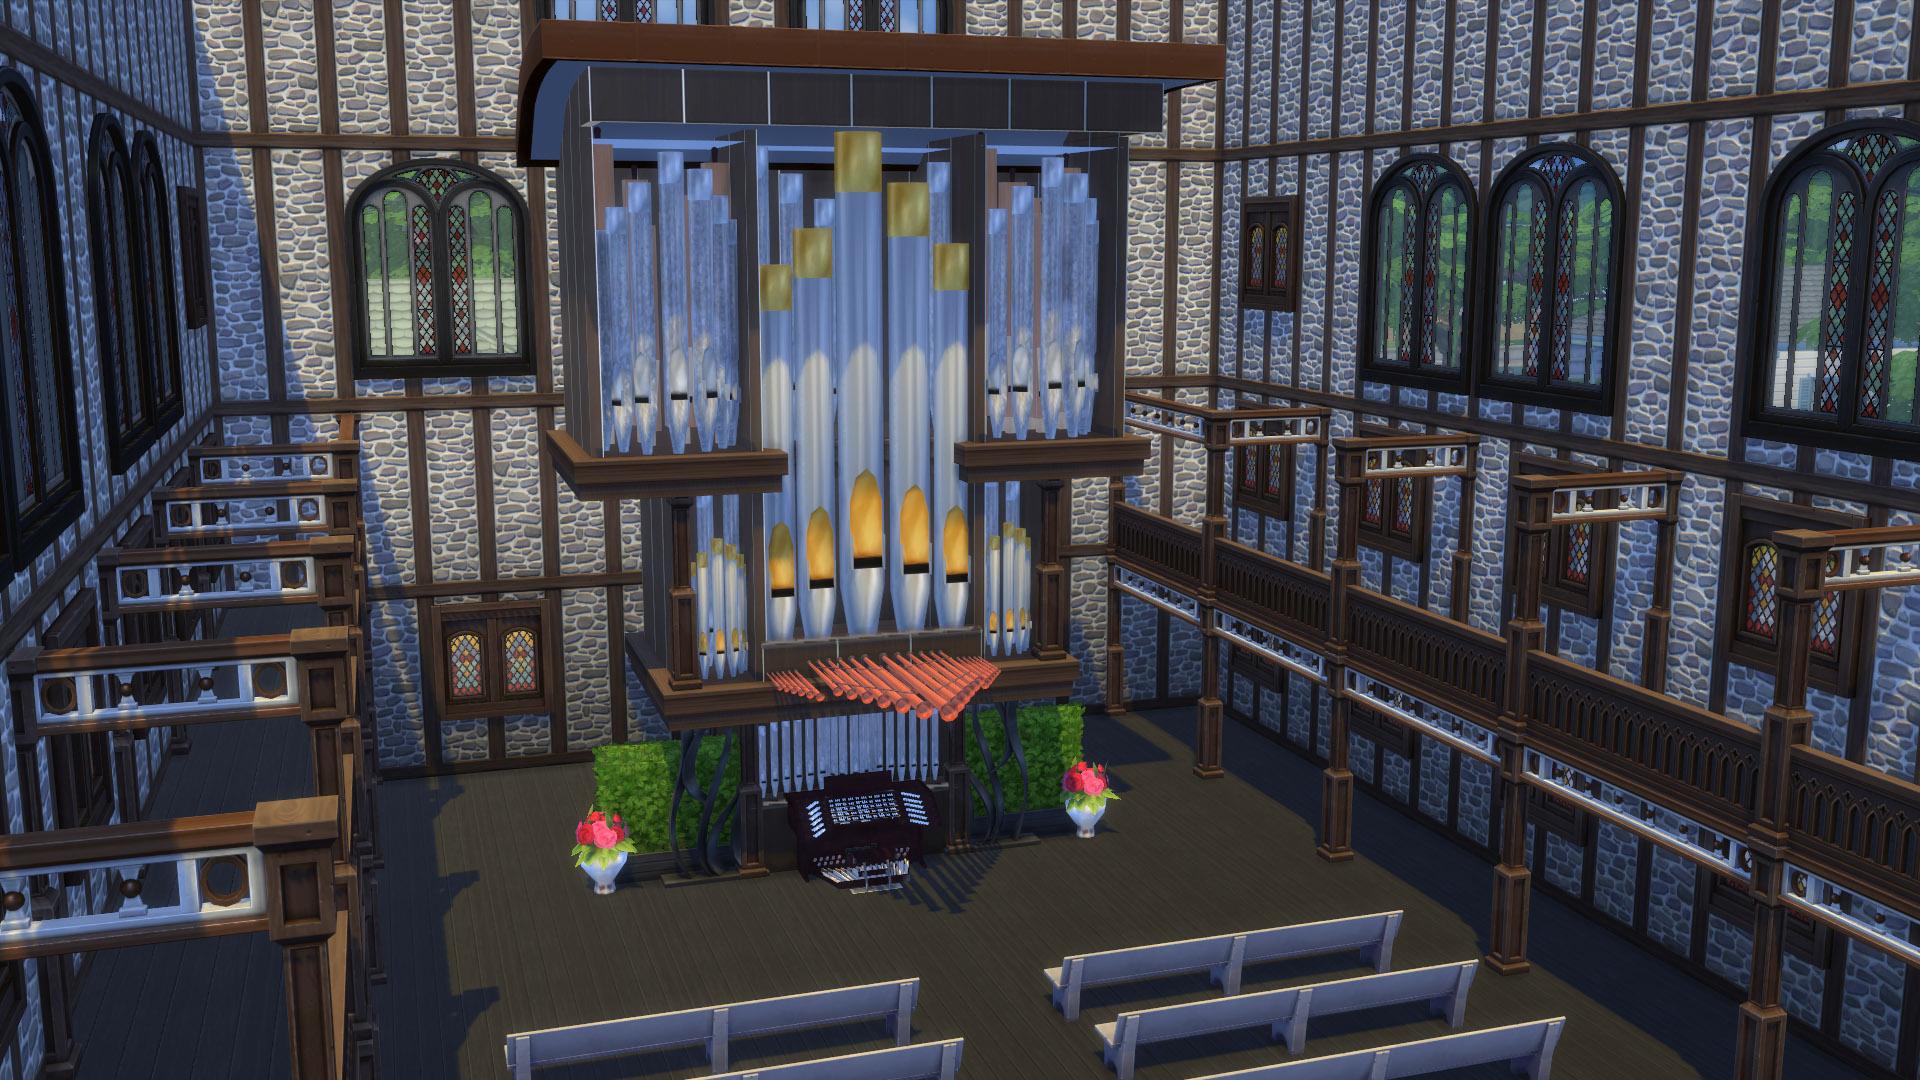 Mod The Sims - Modular Pipe Organ 3